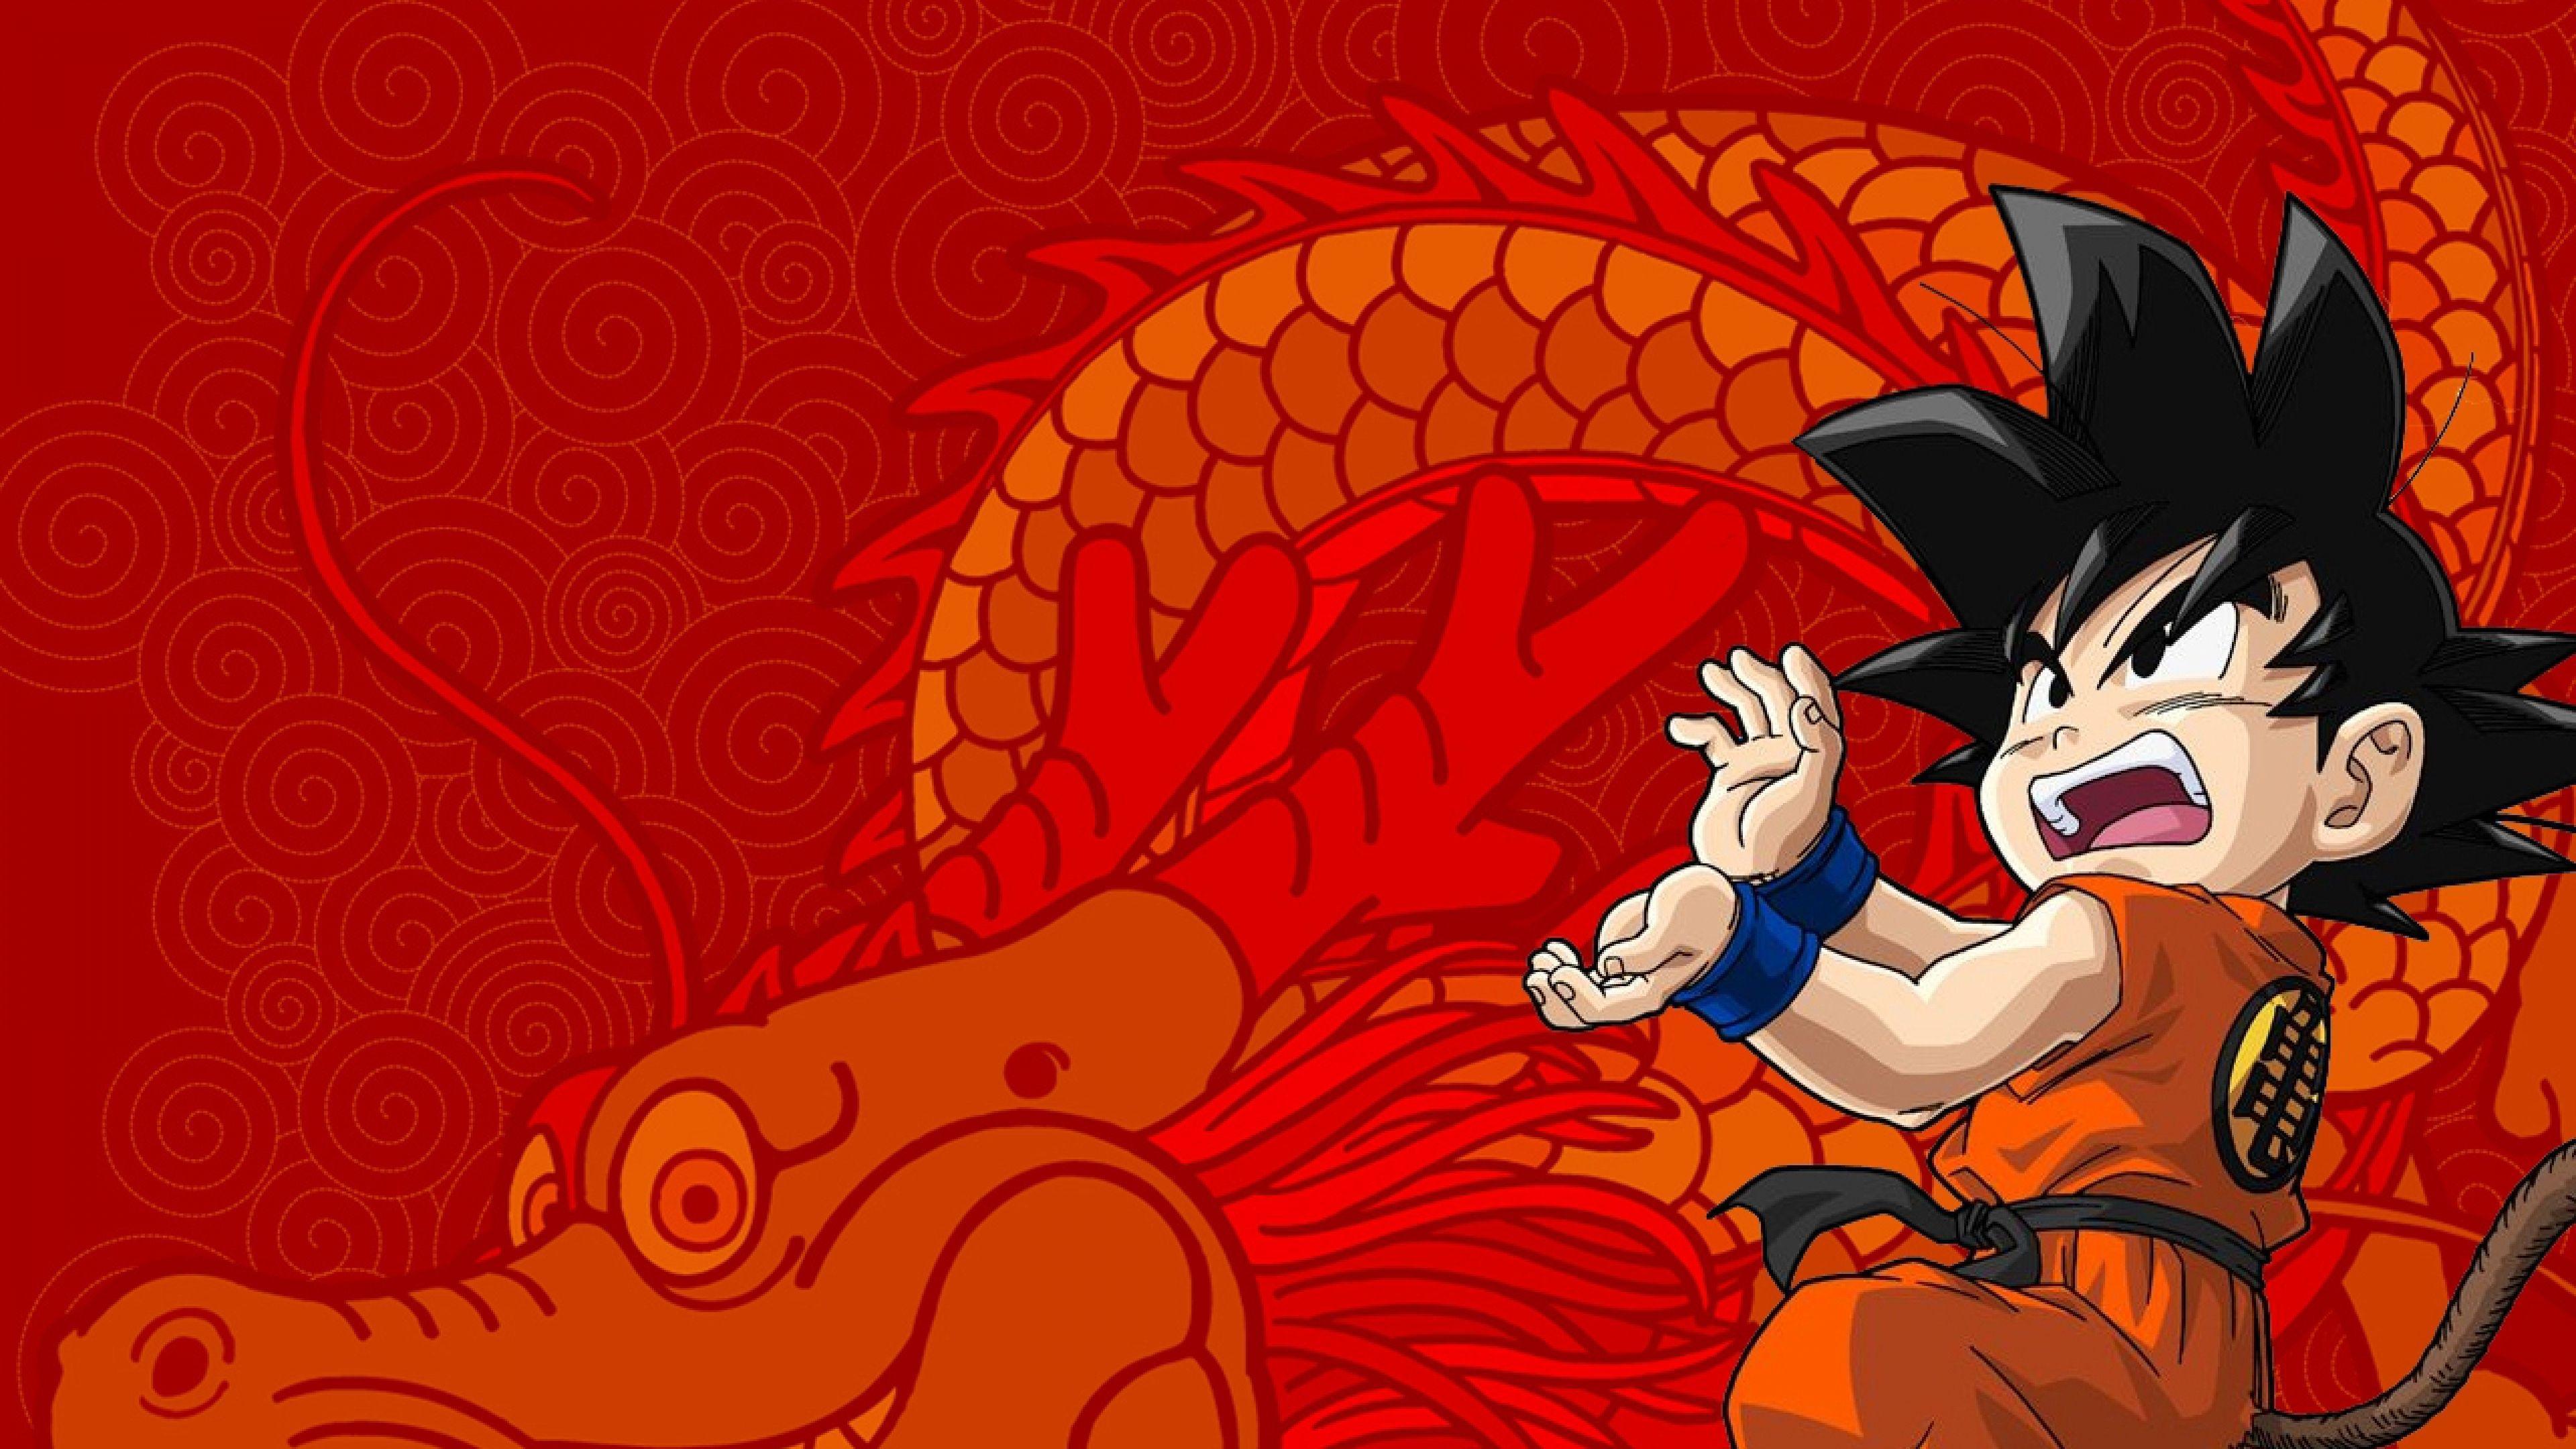 Son-Goku Wallpapers - Wallpaper Cave